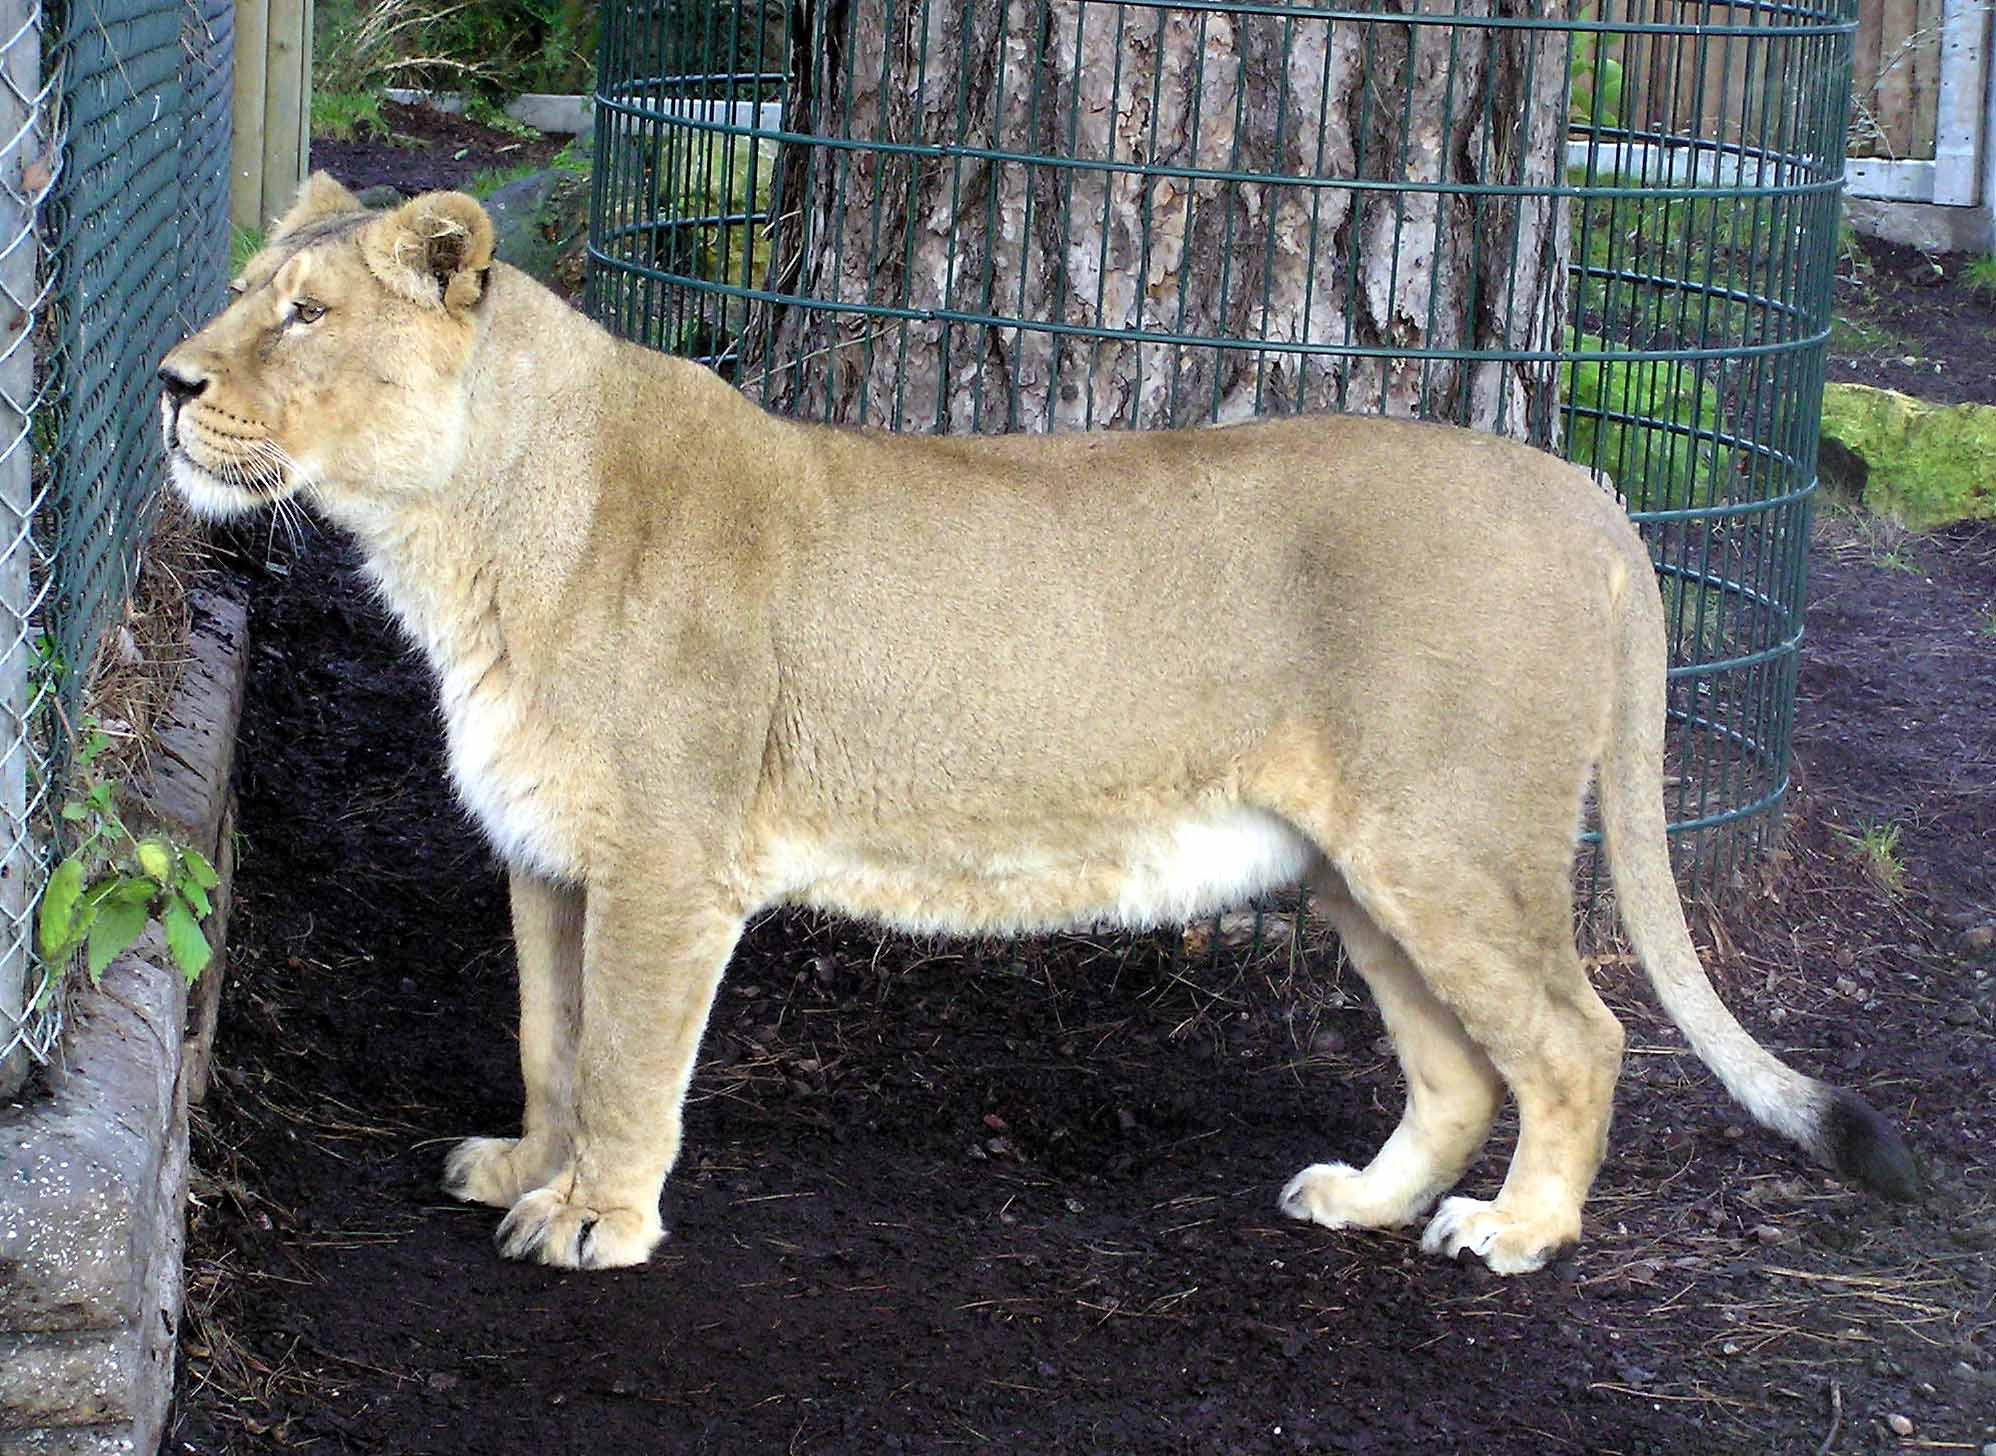 Asiatic Lion (Panthera leo persica) - Wiki